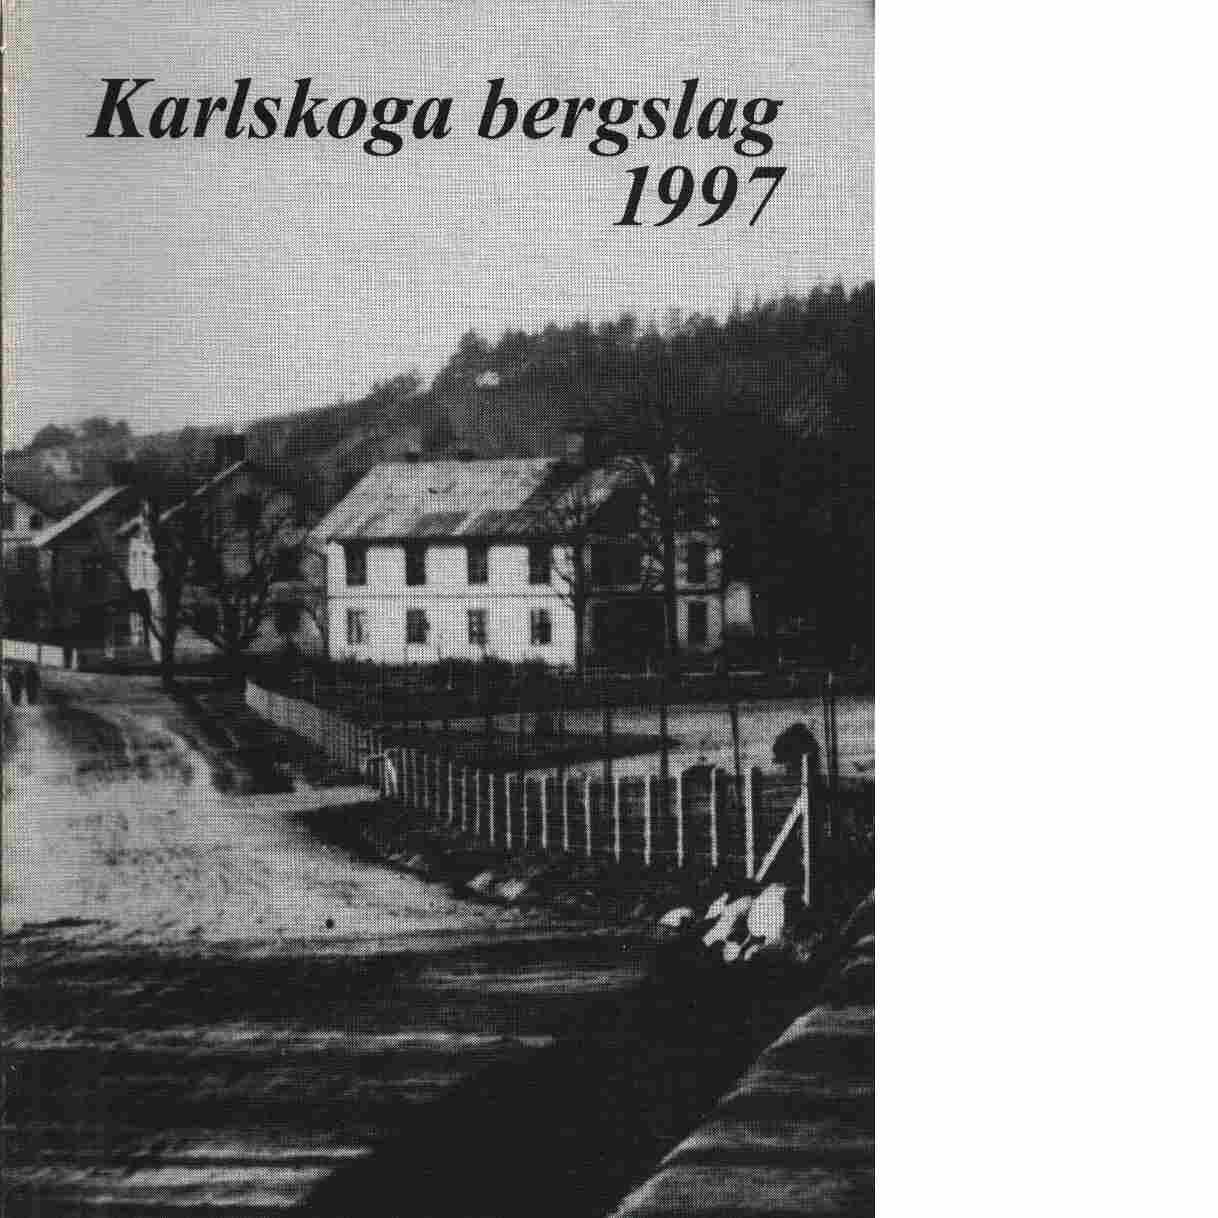 Karlskoga bergslag 1997 / utgiven av Karlskoga bergslags hembygdsförening - Red.